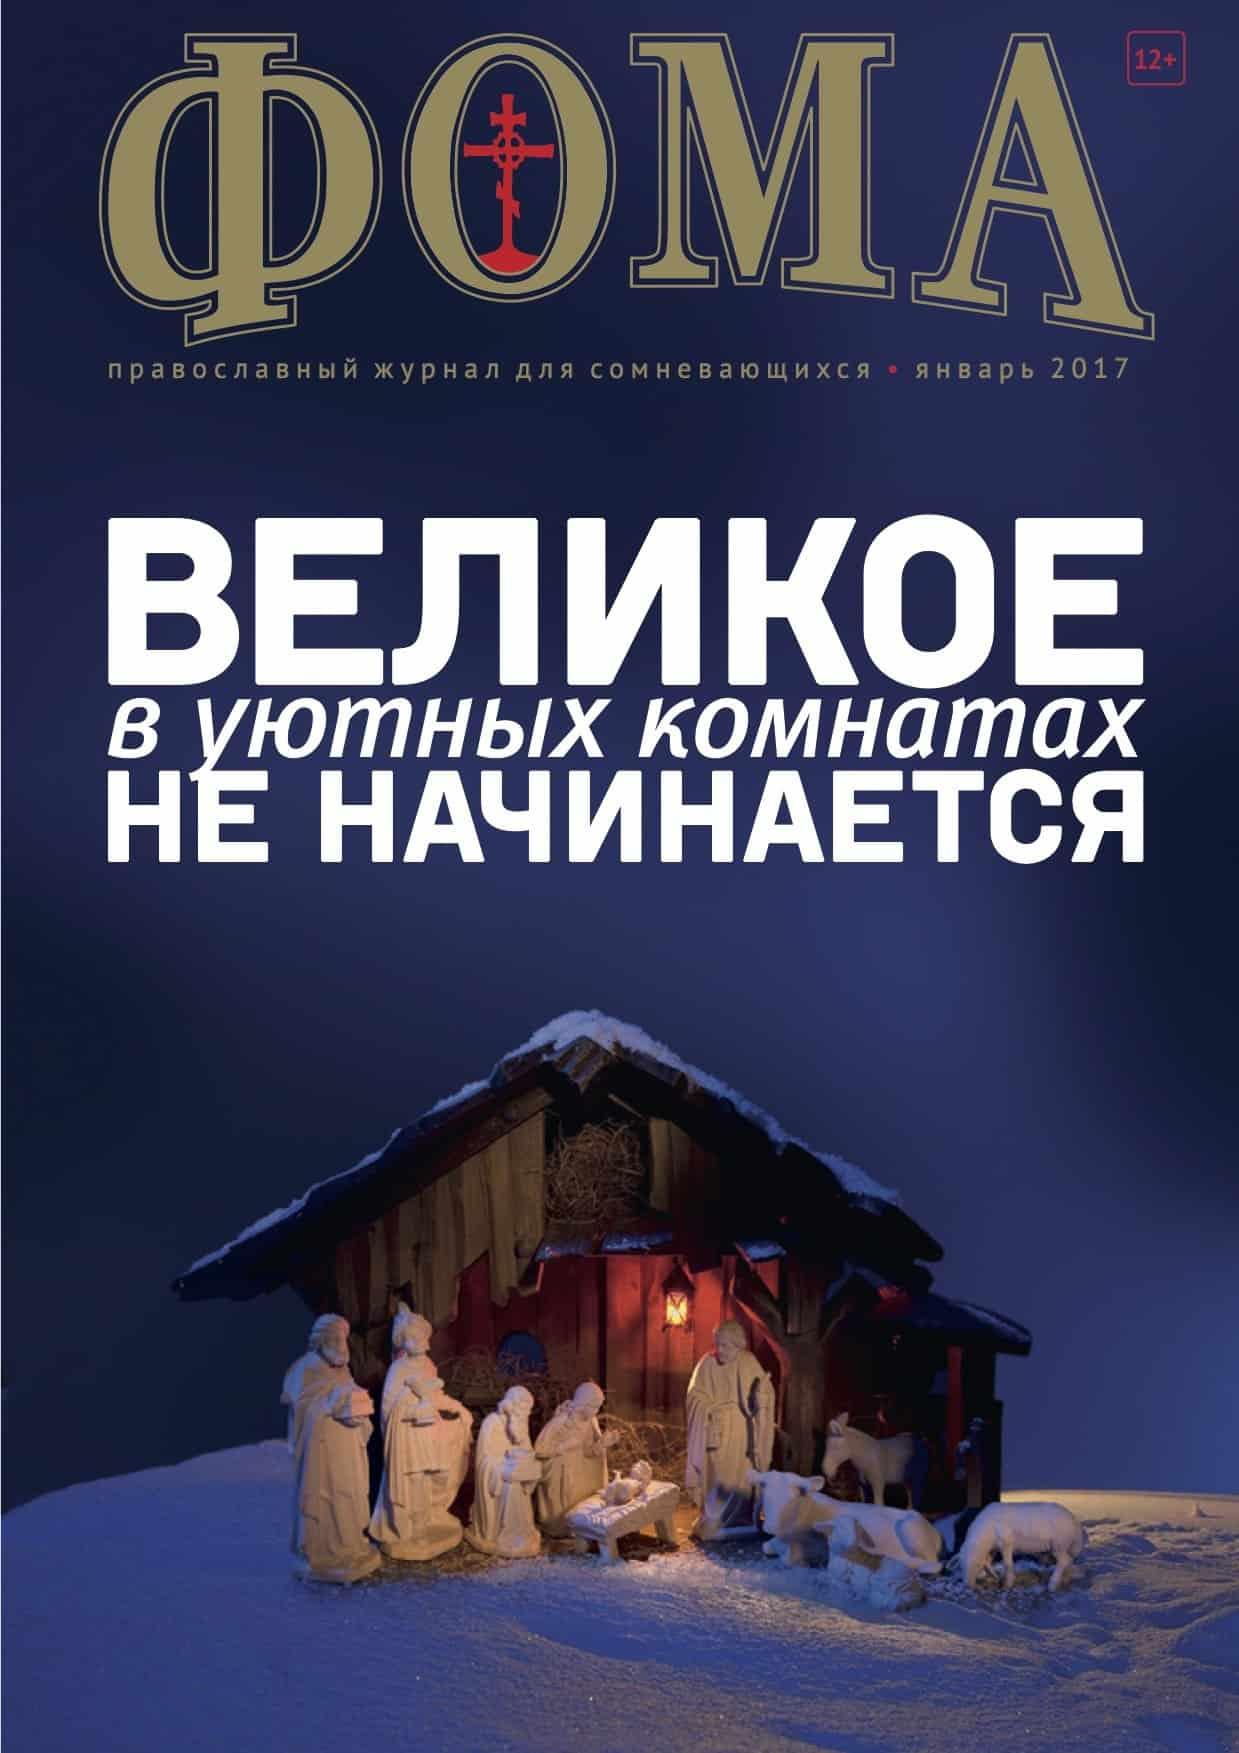 фома православный журнал журнал